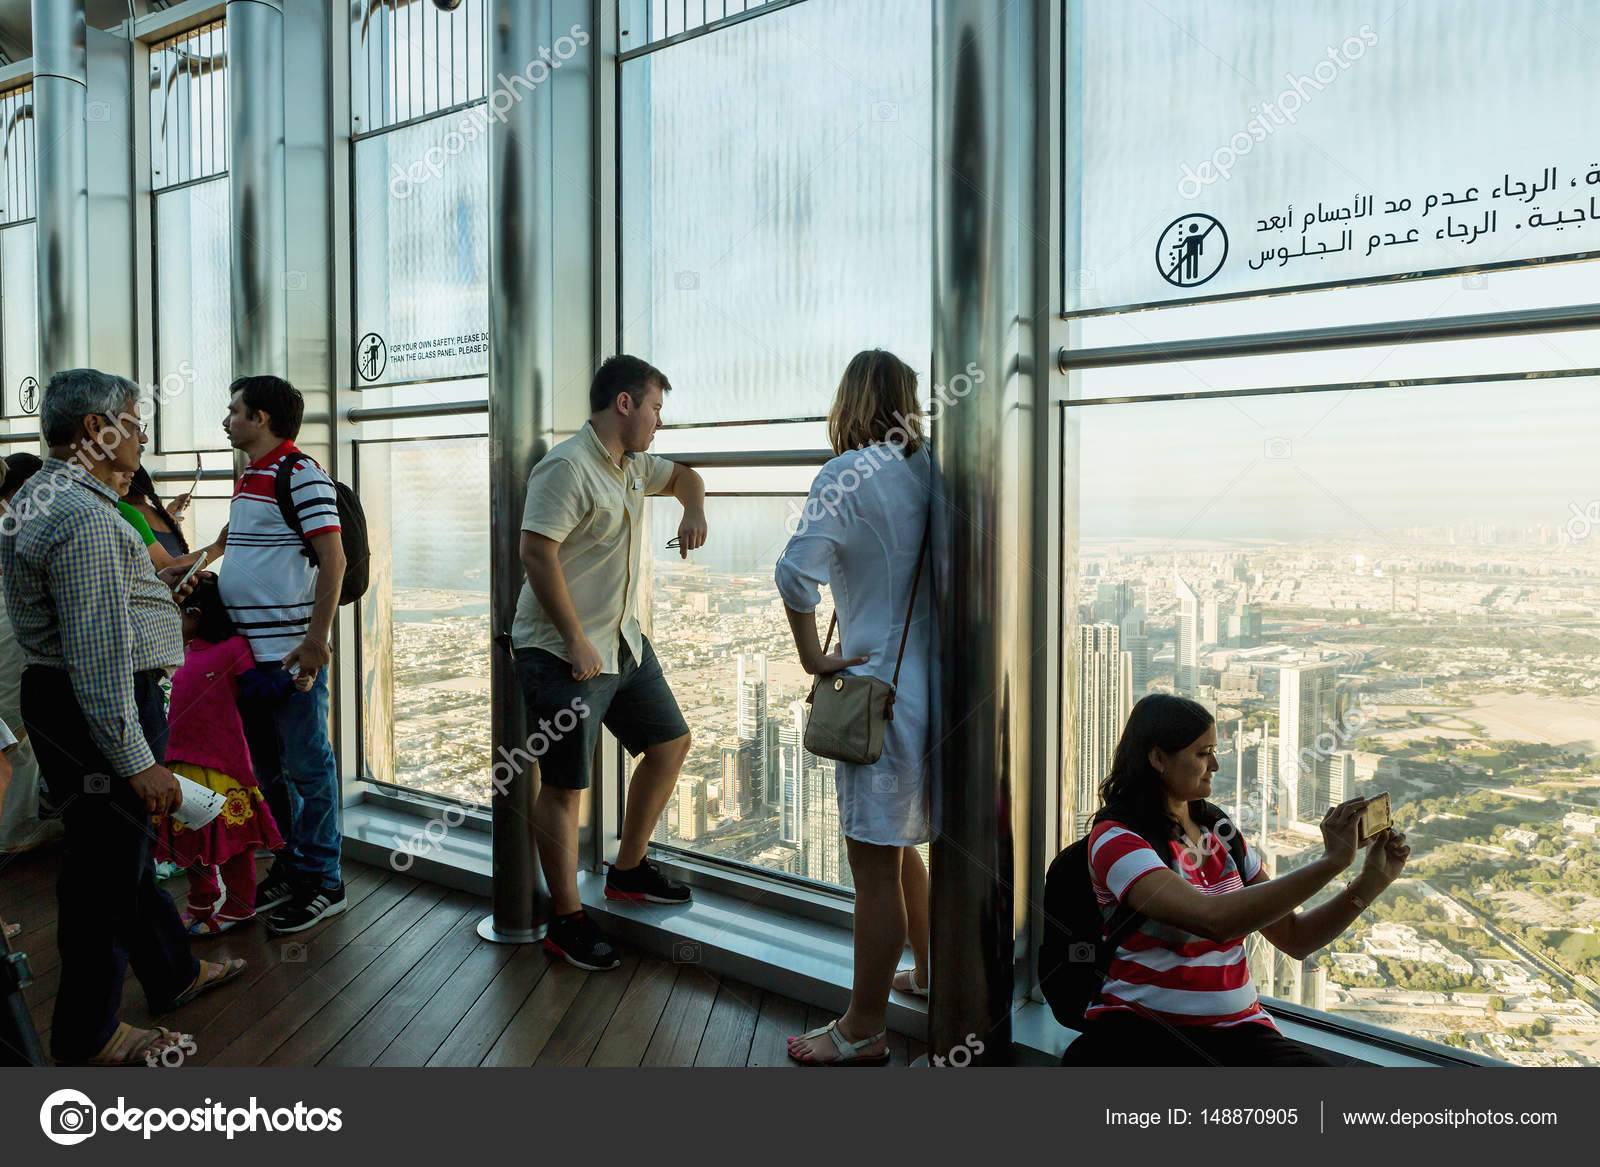 DUBAI, UAE - NOVEMBER 8, 2016: Tourists on Burj Khalifa